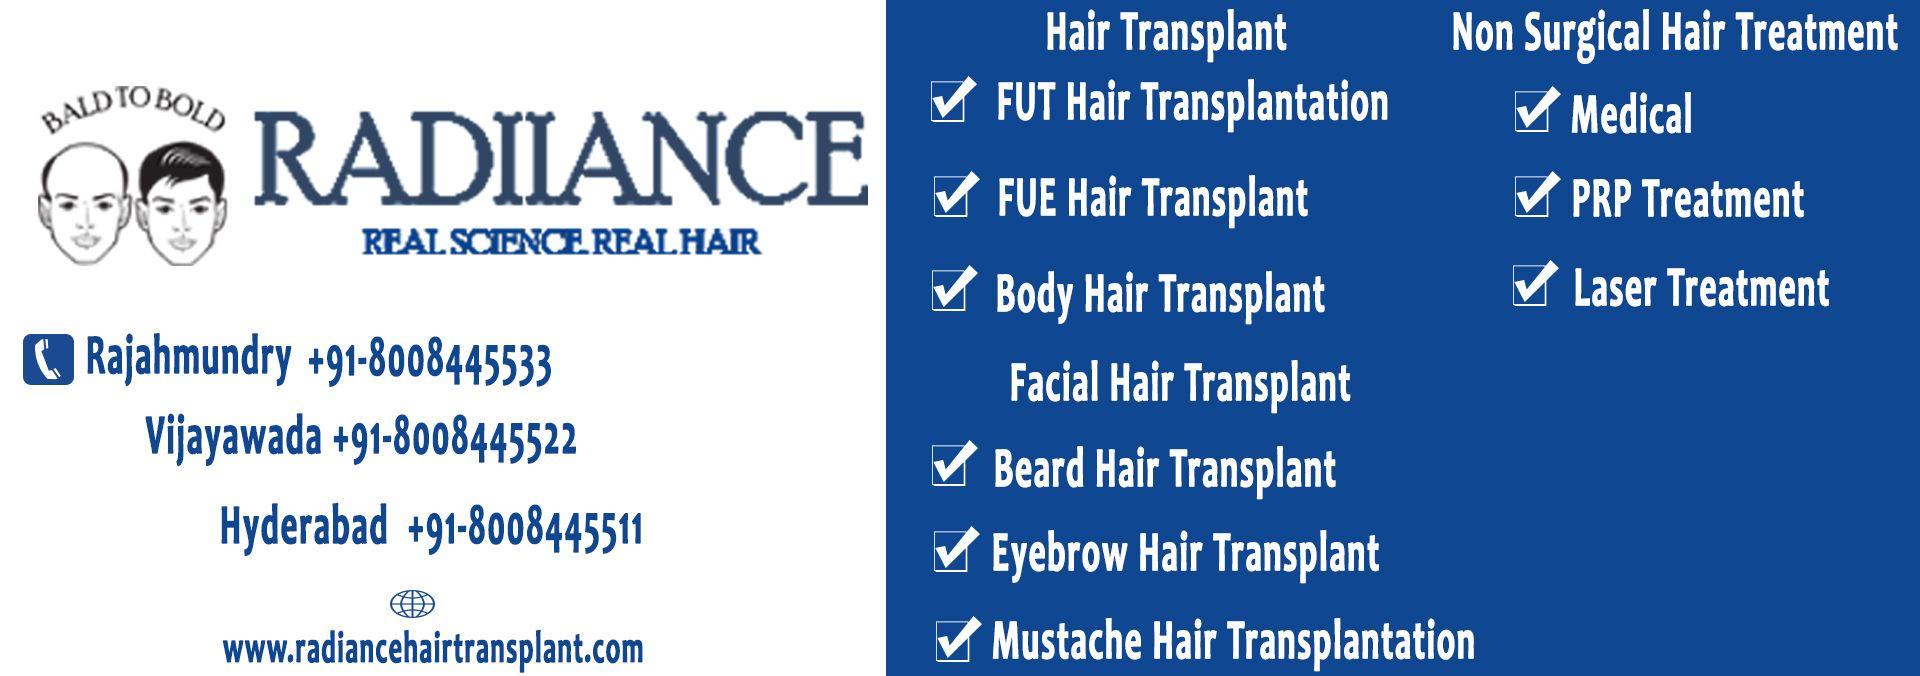 RadianceServices #HairTransplant #FUTHairTransplantation # ...